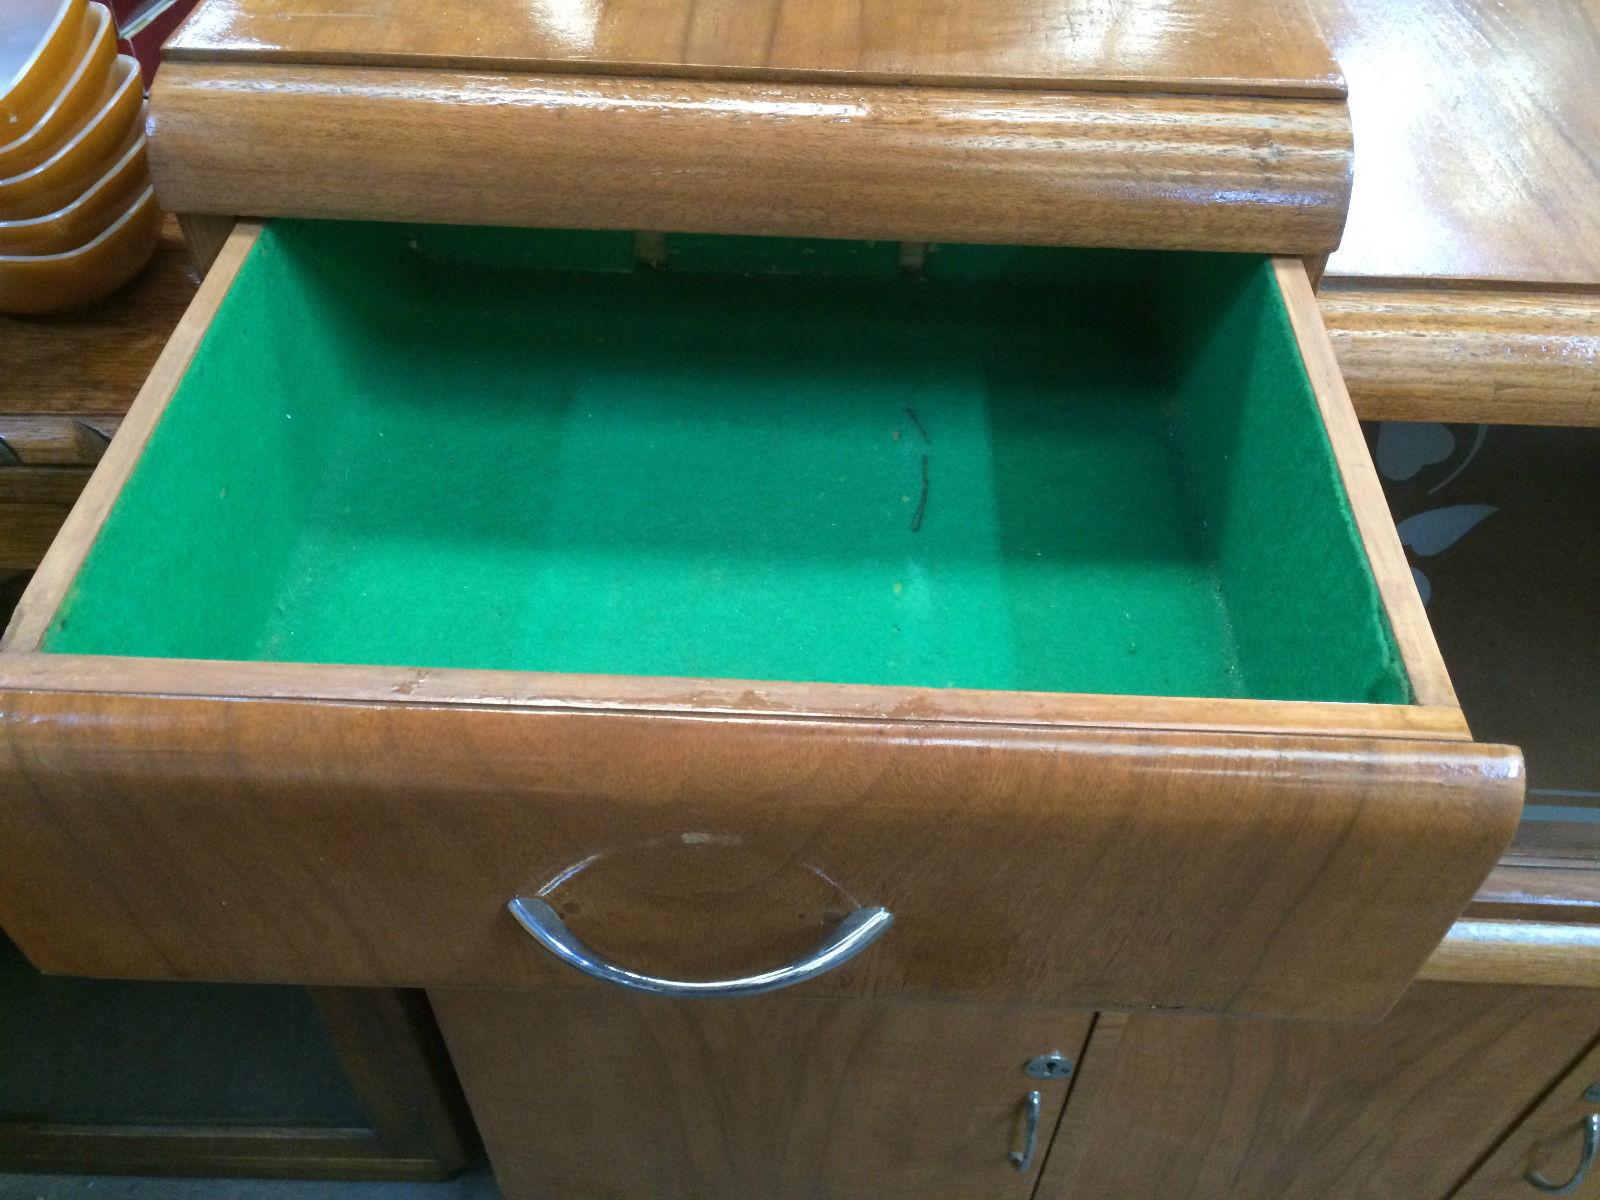 Vintage 2 Tier Sideboard Buffet Display Cabinet | Halsey Road Recyclers